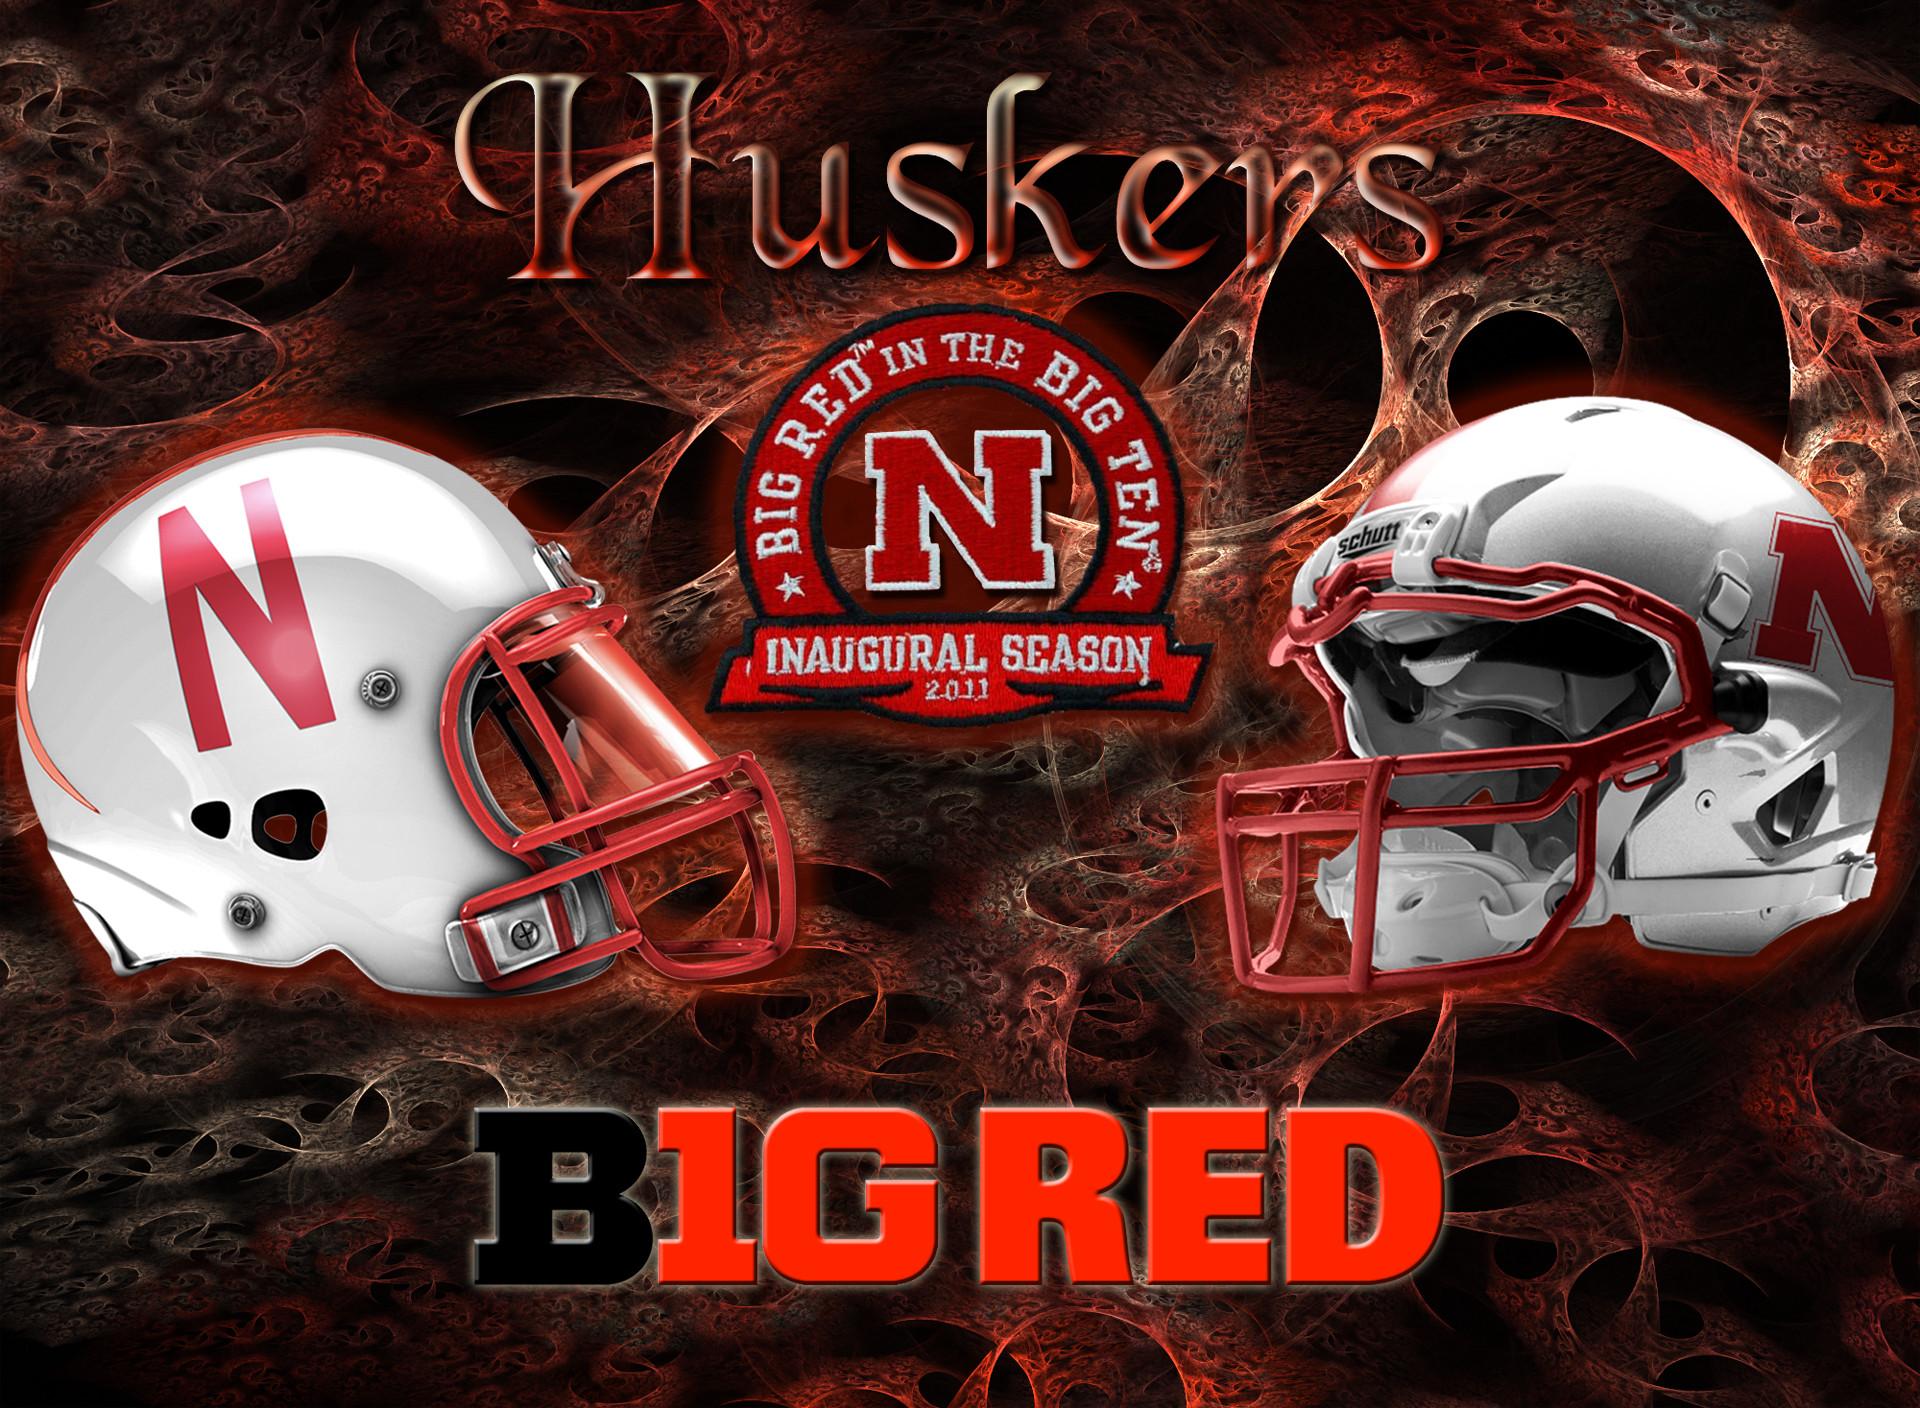 Nebraska Cornhuskers B1G Red Wallpaper   Free Download Wallpaper .